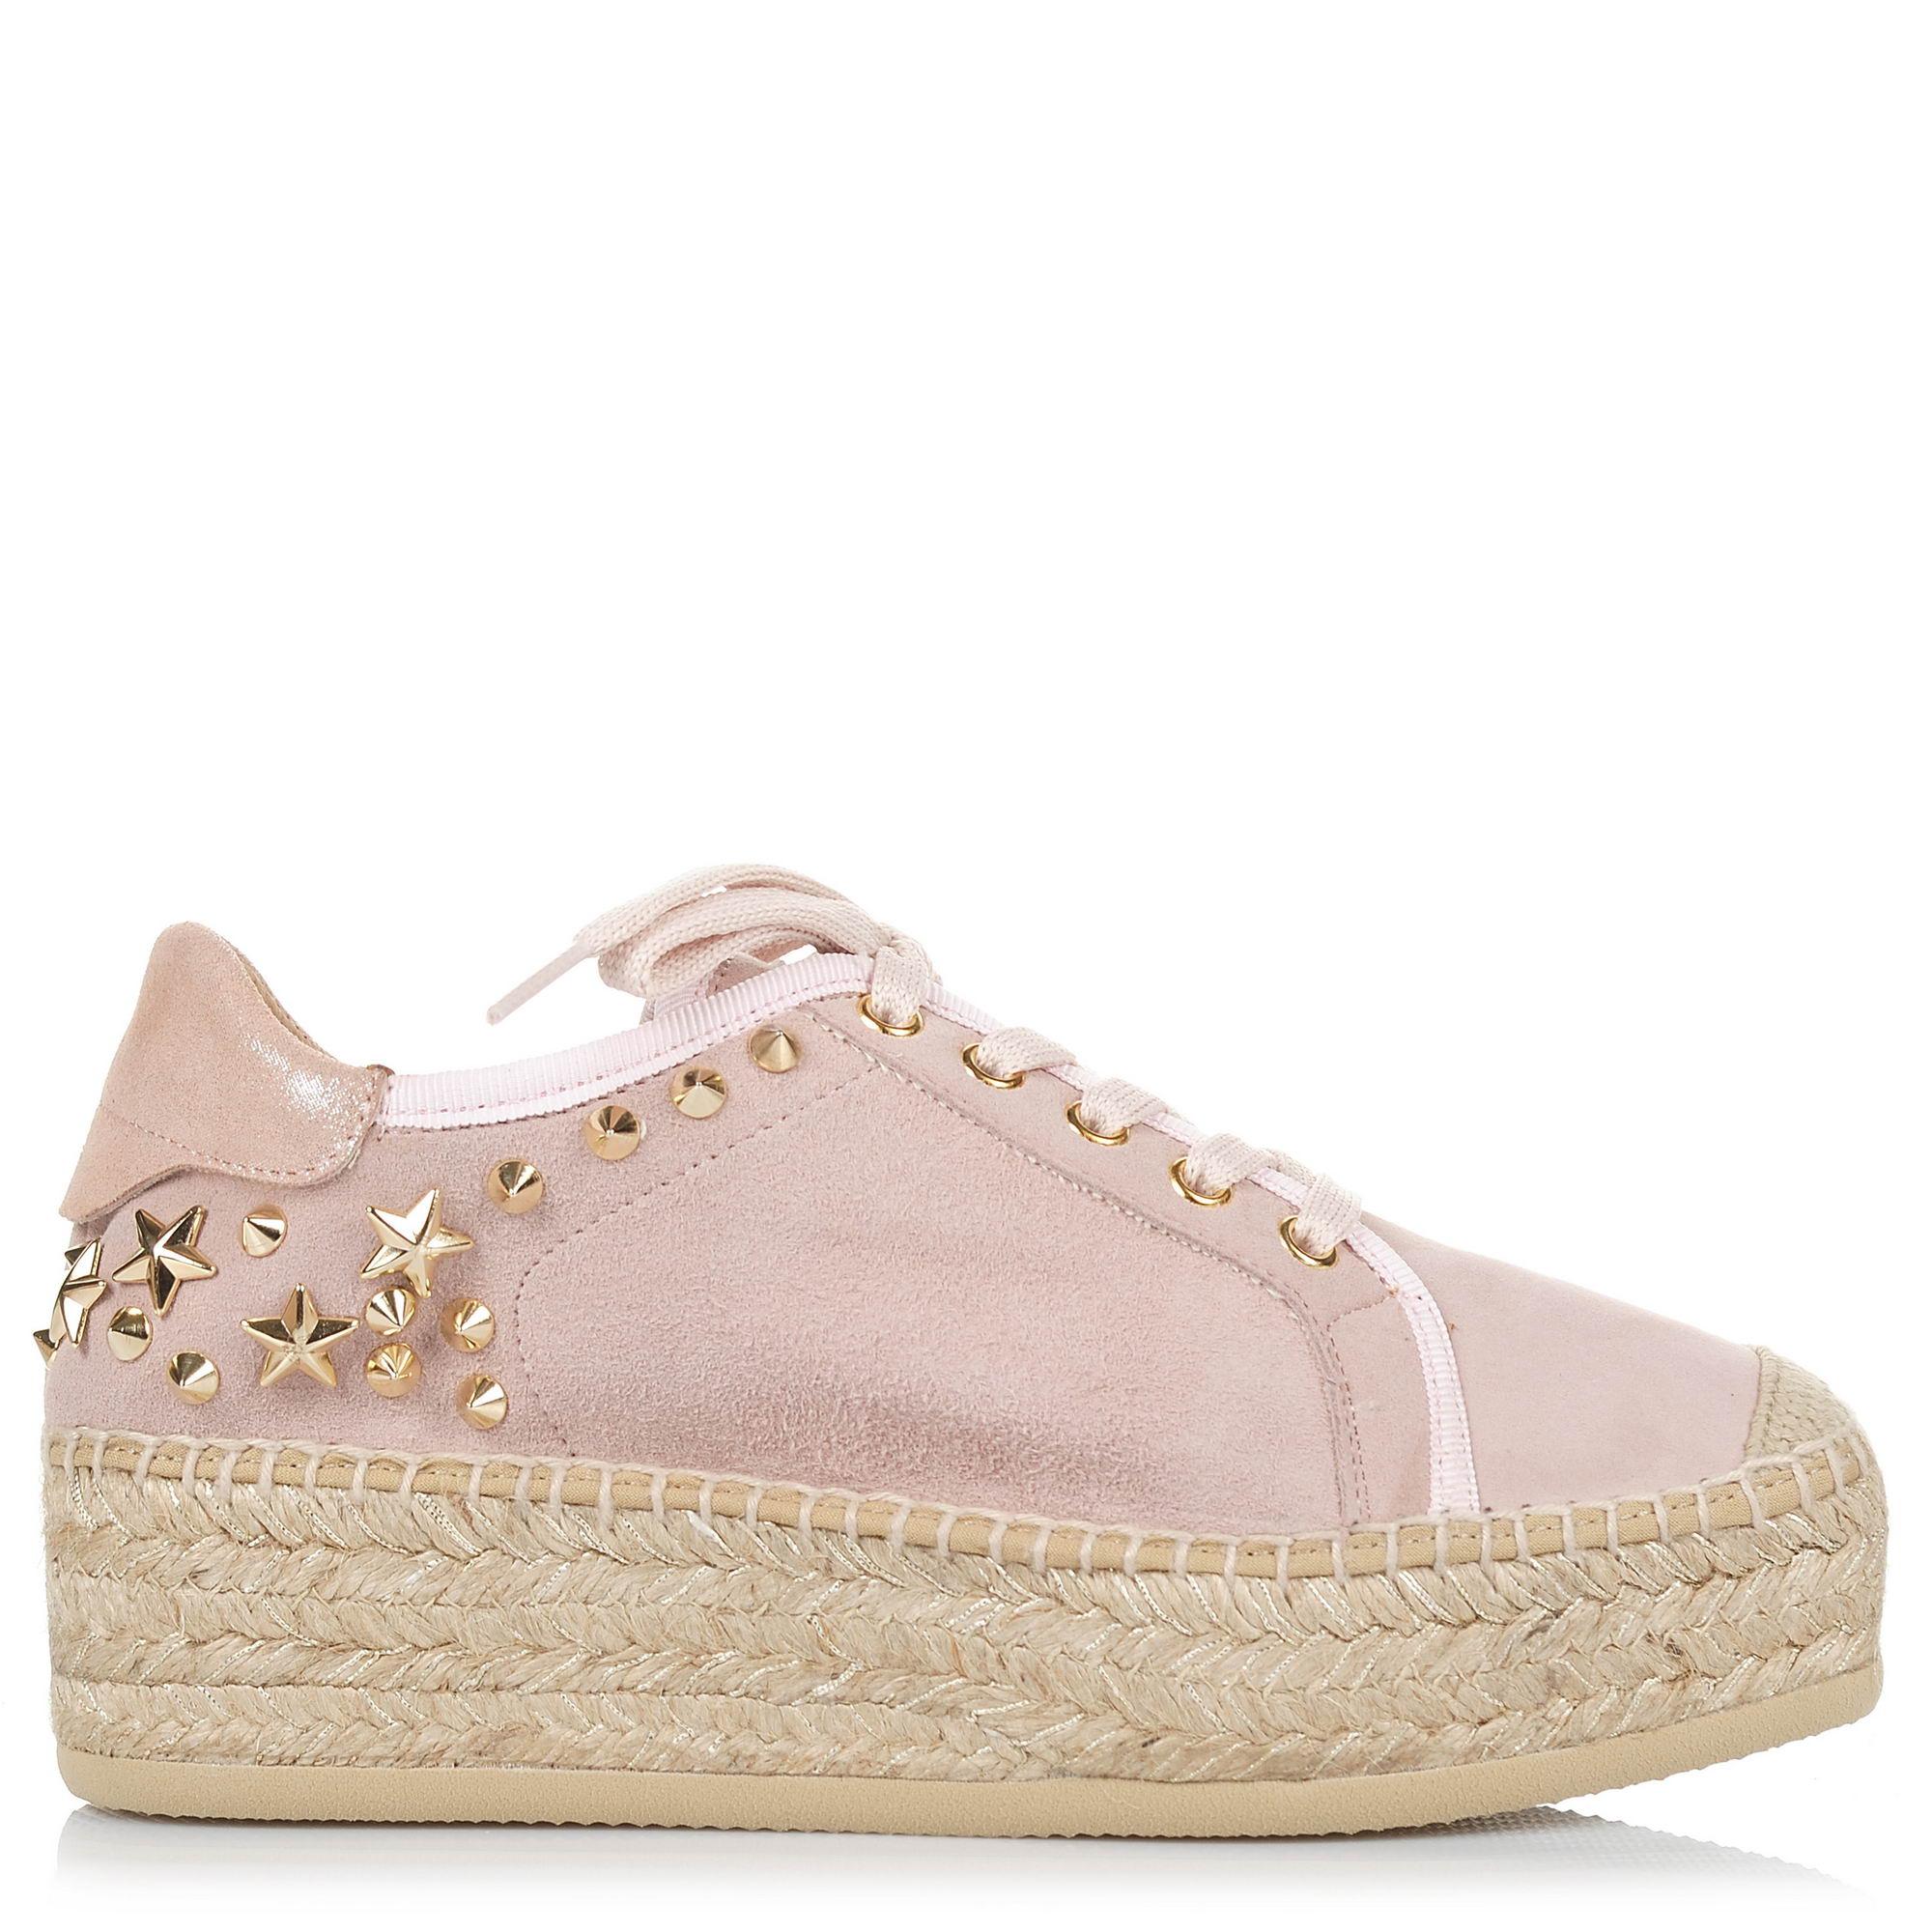 Suede Δερμάτινες Εσπαντρίγιες Kanna KV8211 γυναικα   γυναικείο παπούτσι